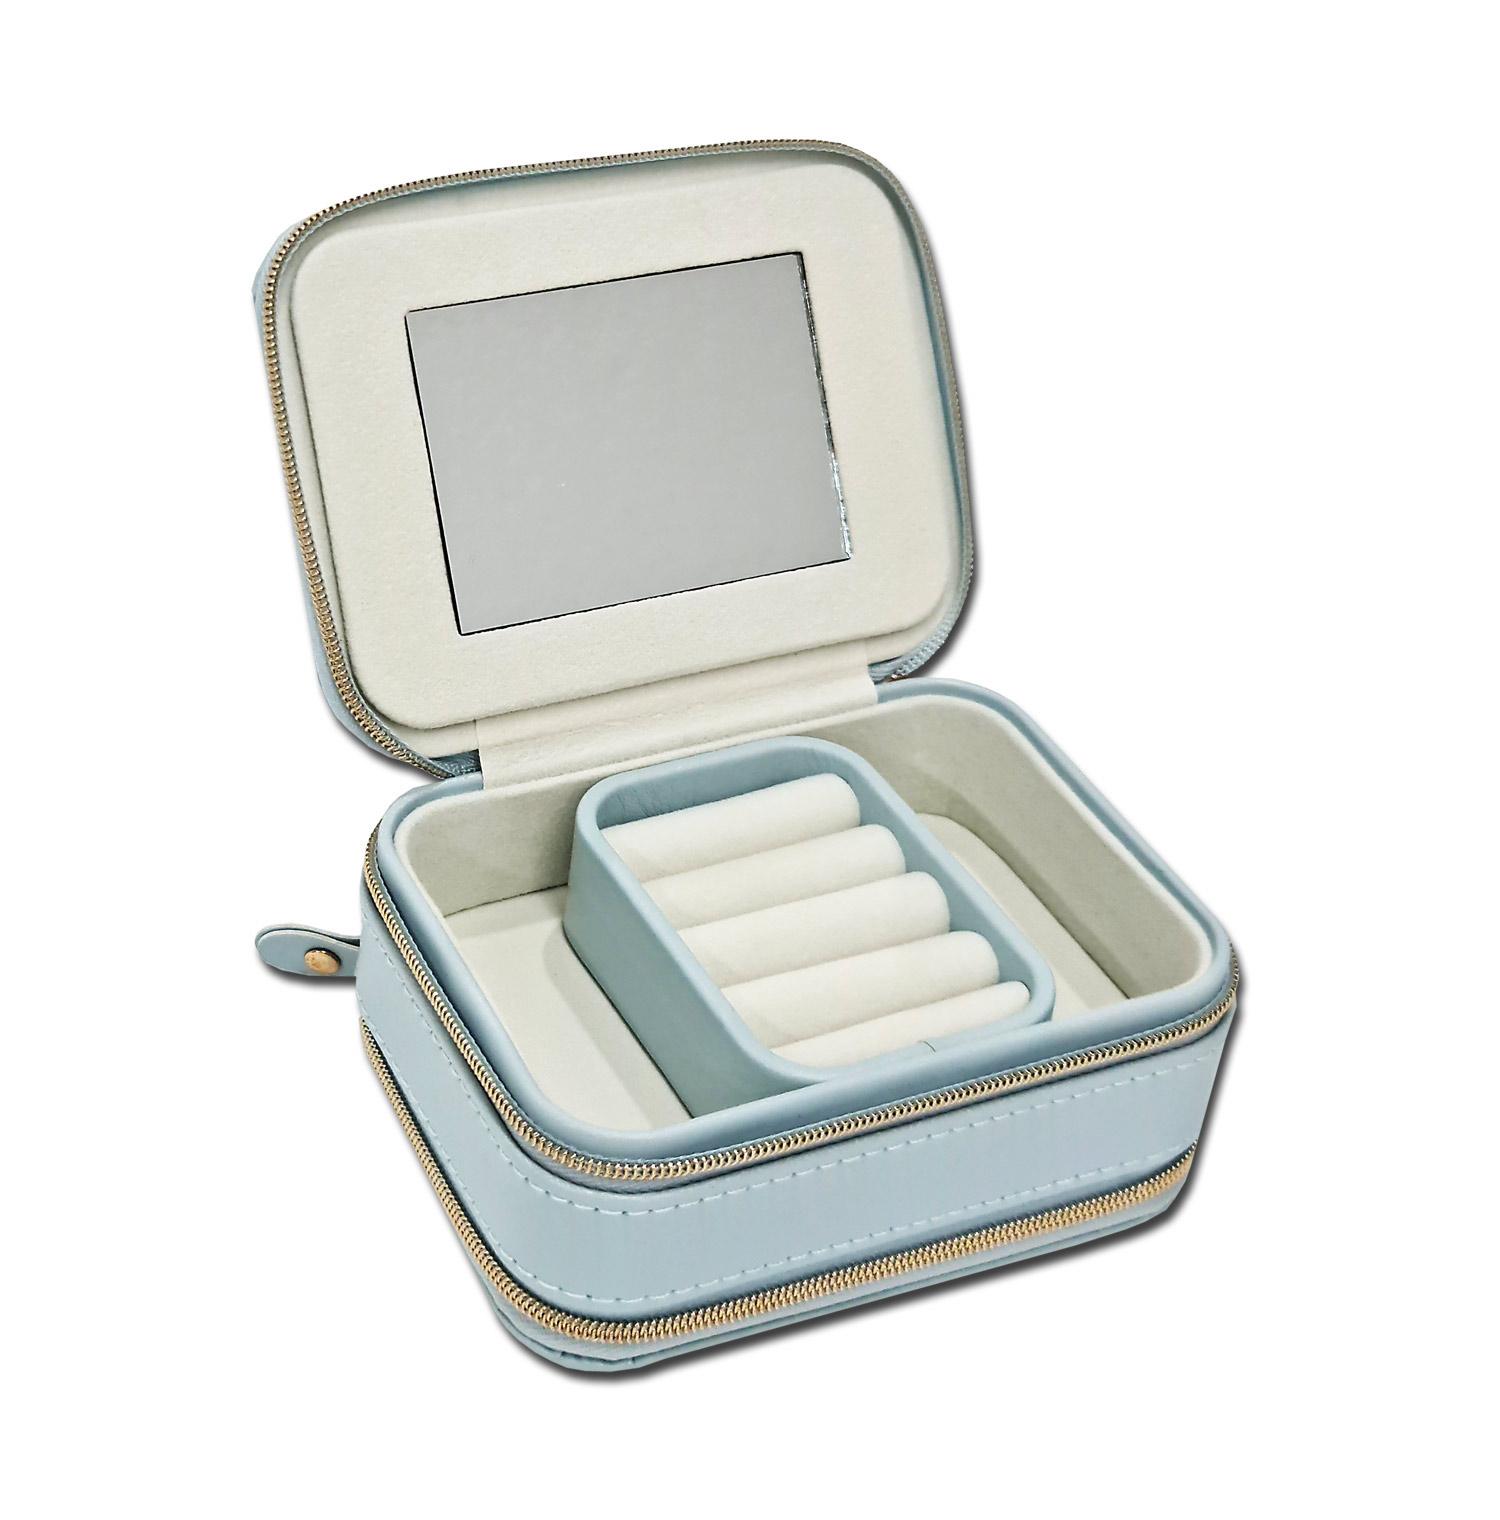 Mini Porta-Joias duplo retangular - Azul bebê / Marfim